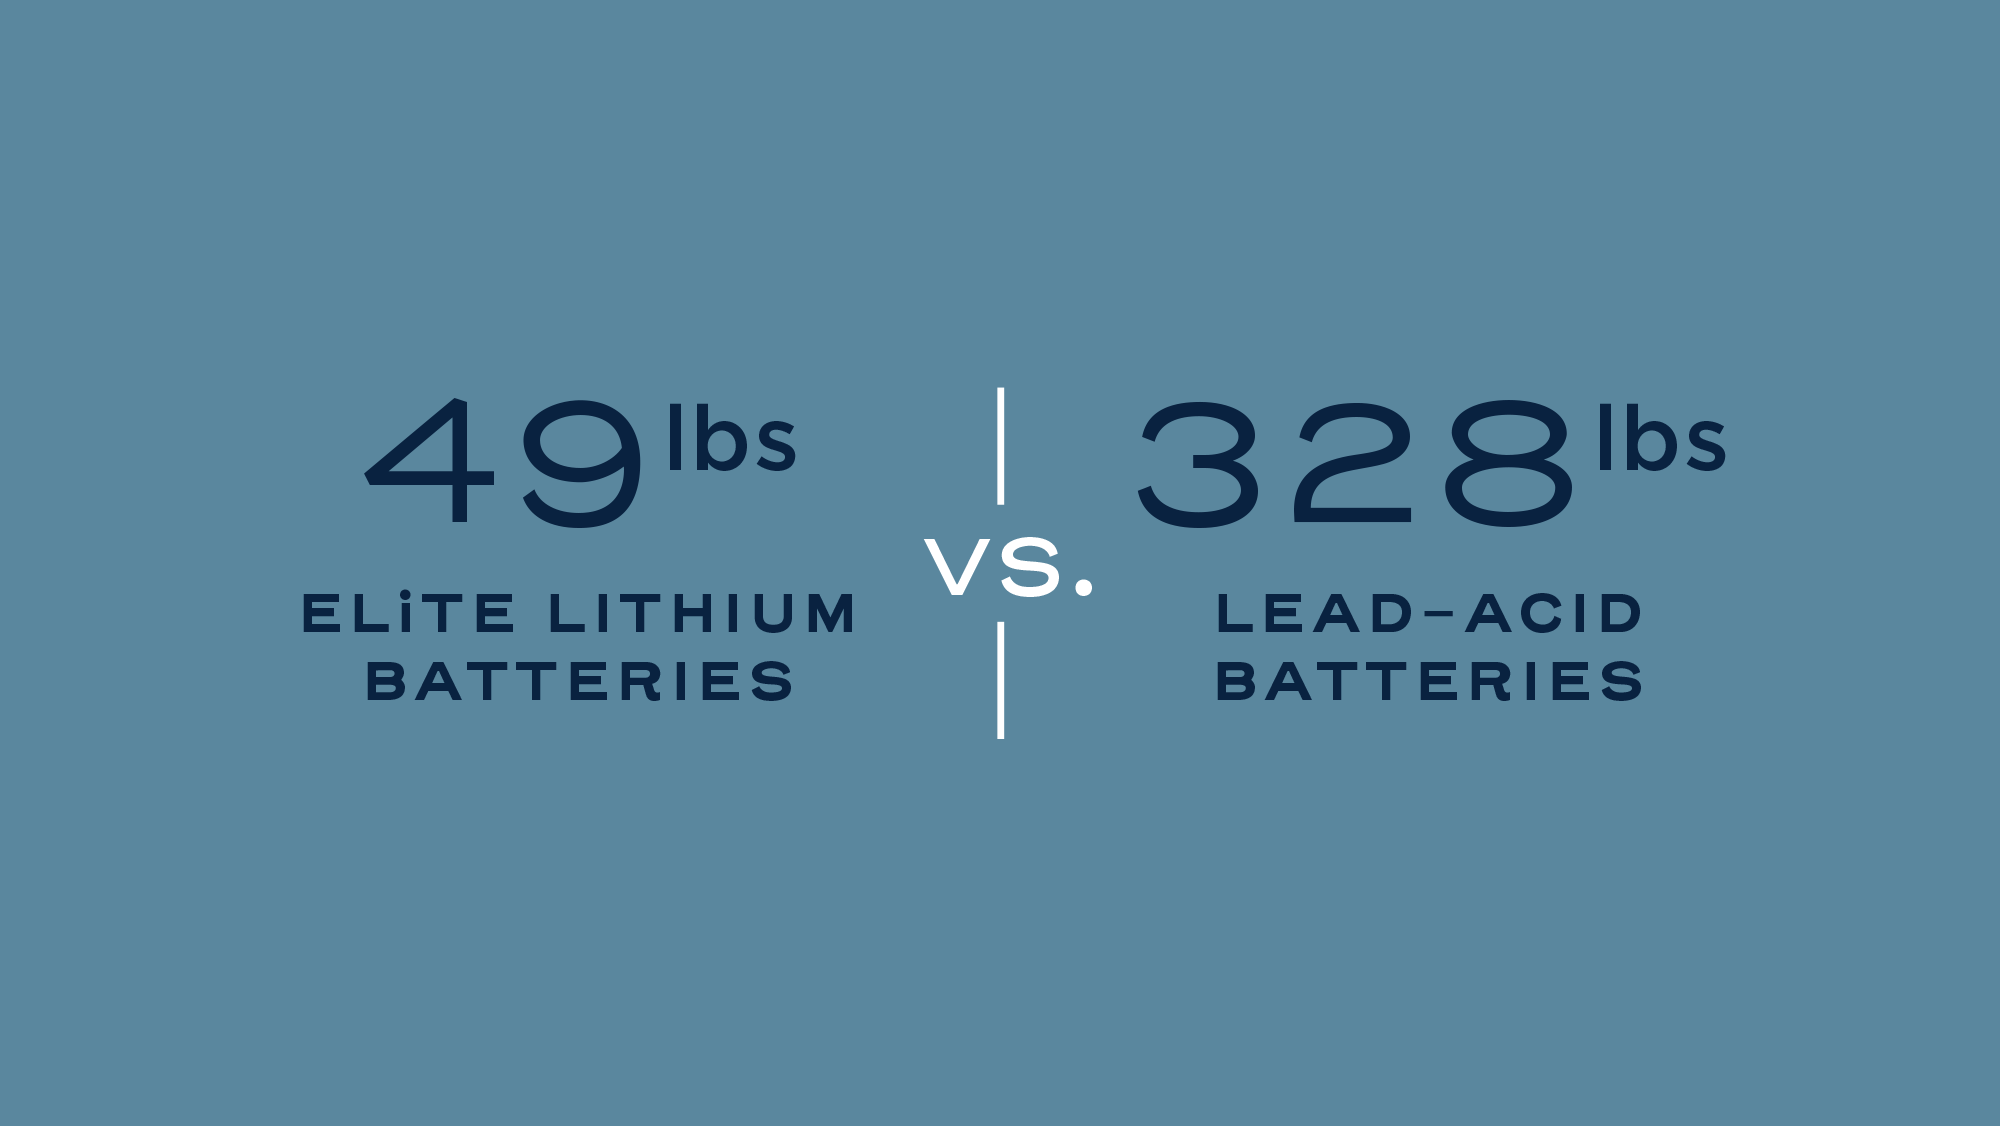 ELiTE Lithium batteries 49lbs  vs. Lead-Acid Batteries 328 lbs.